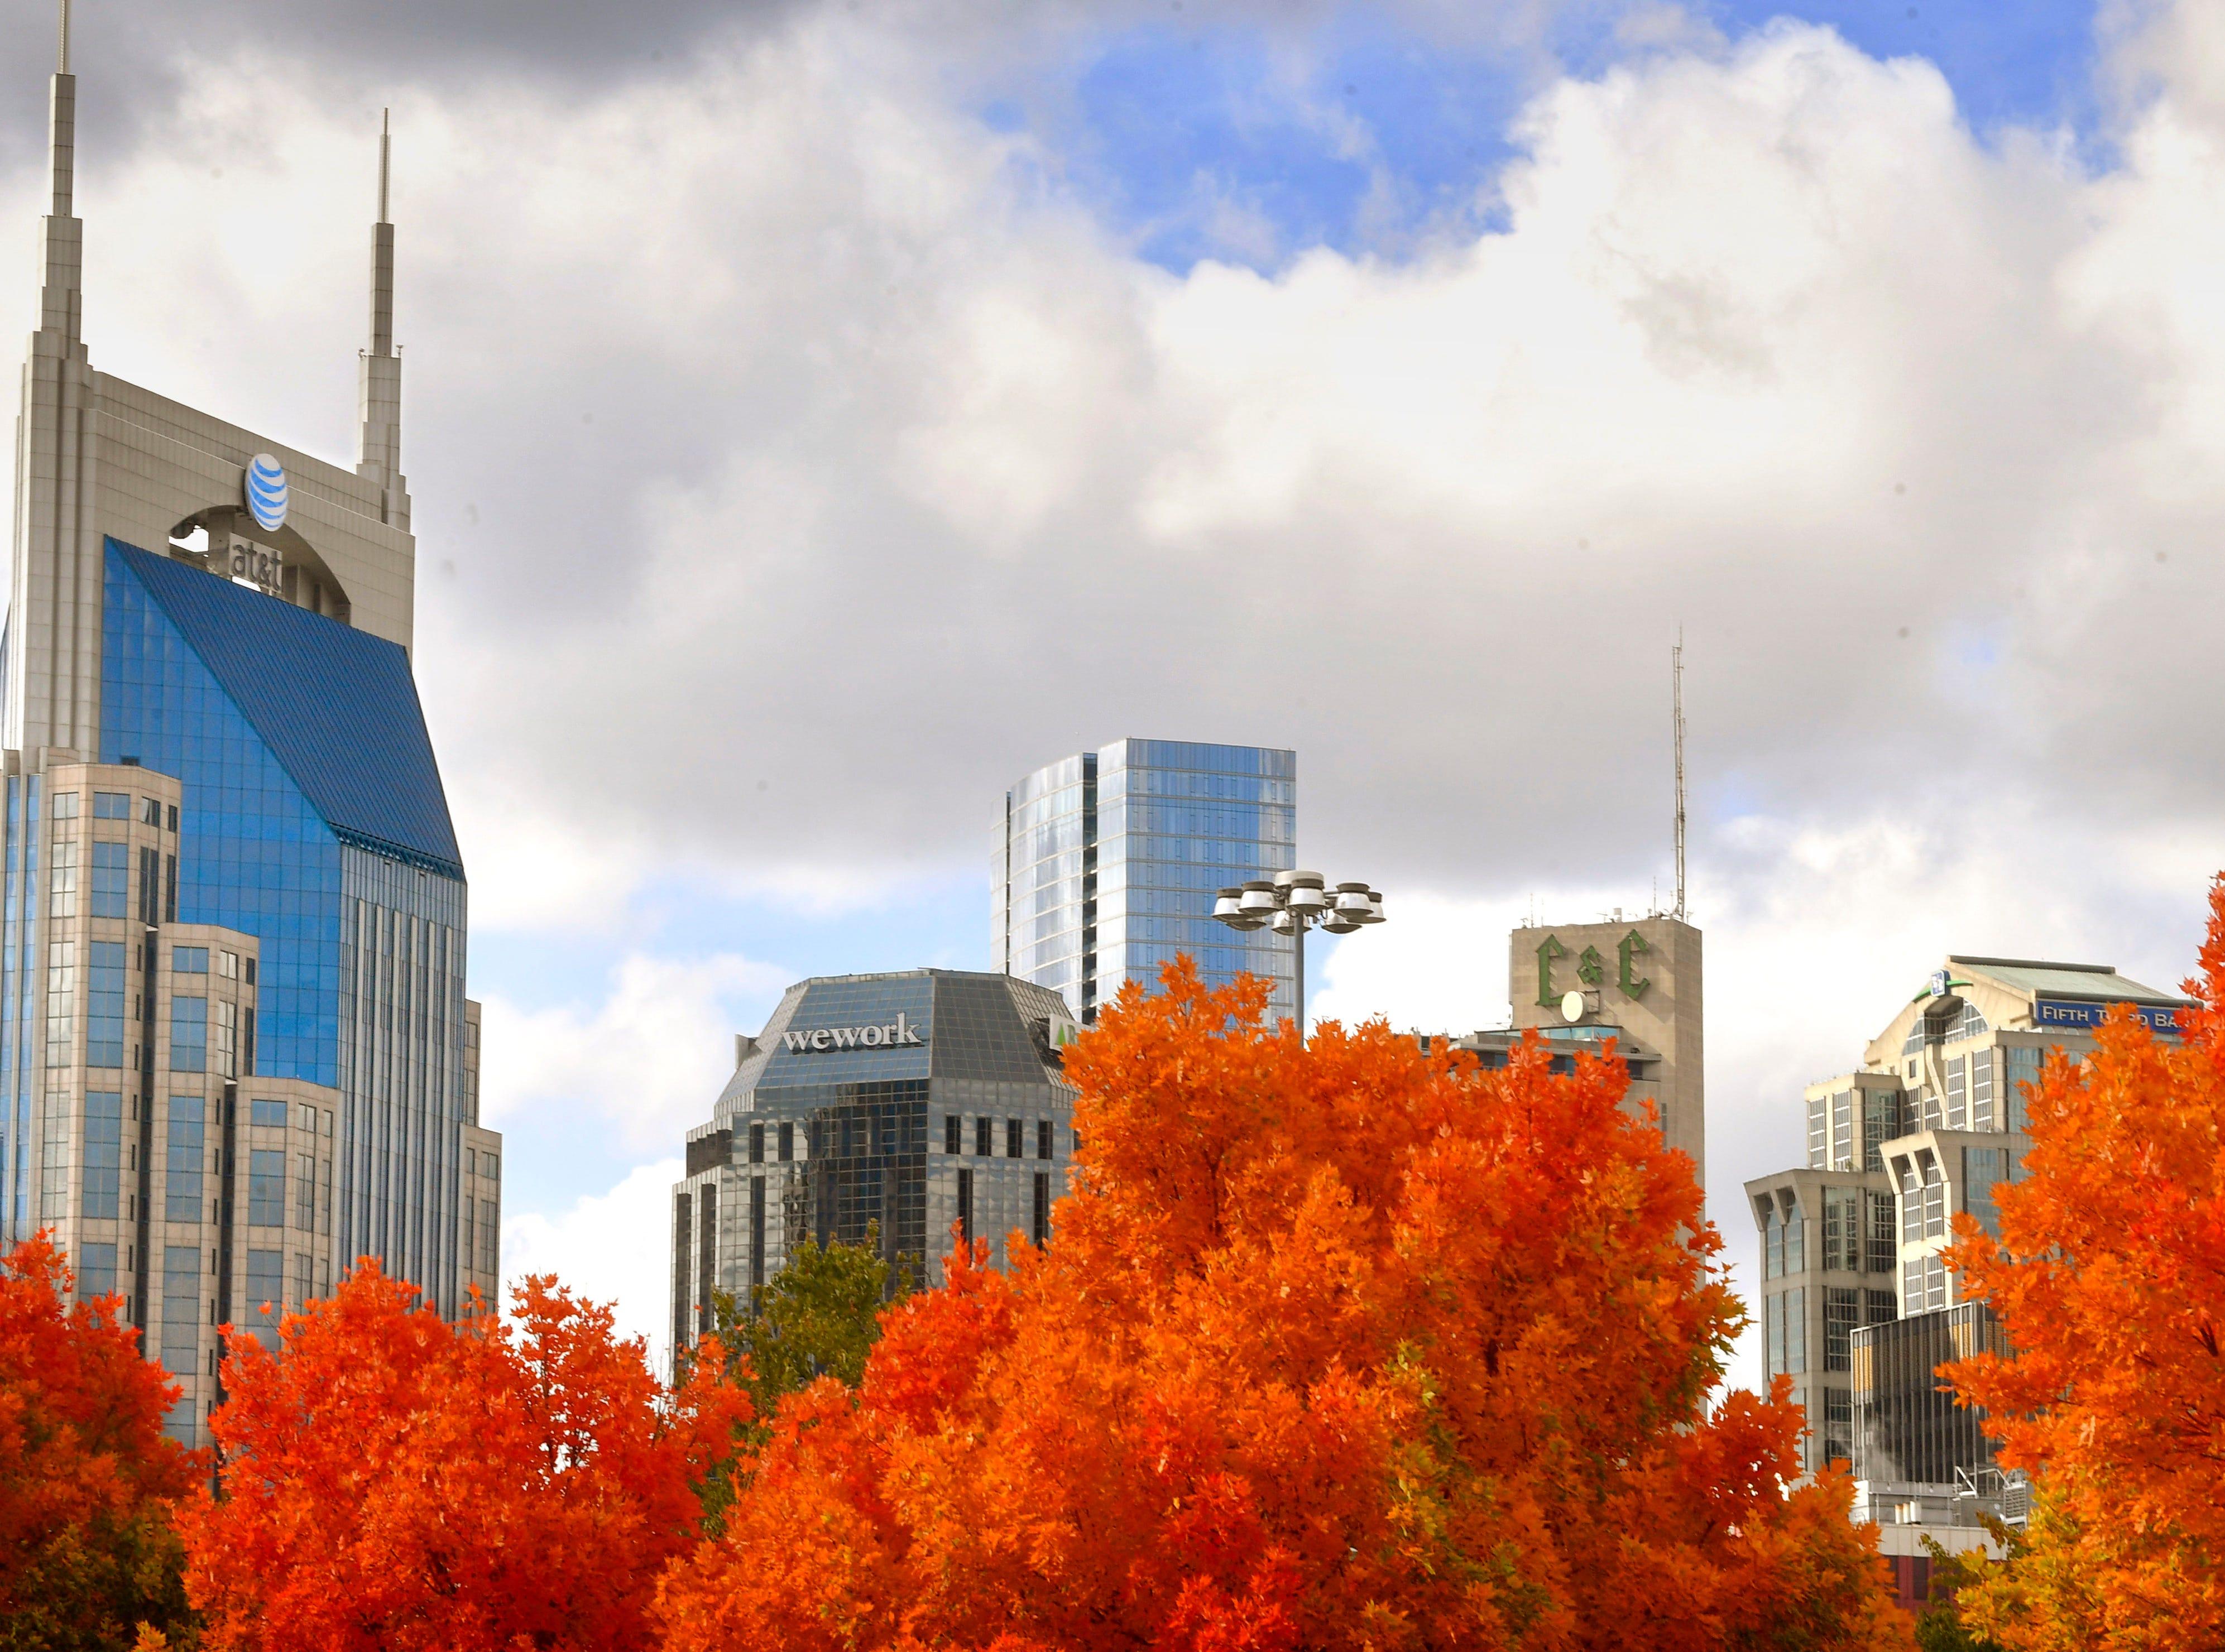 Fall and the Nashville skyline Saturday Nov. 3, 2018, in Nashville, Tenn.